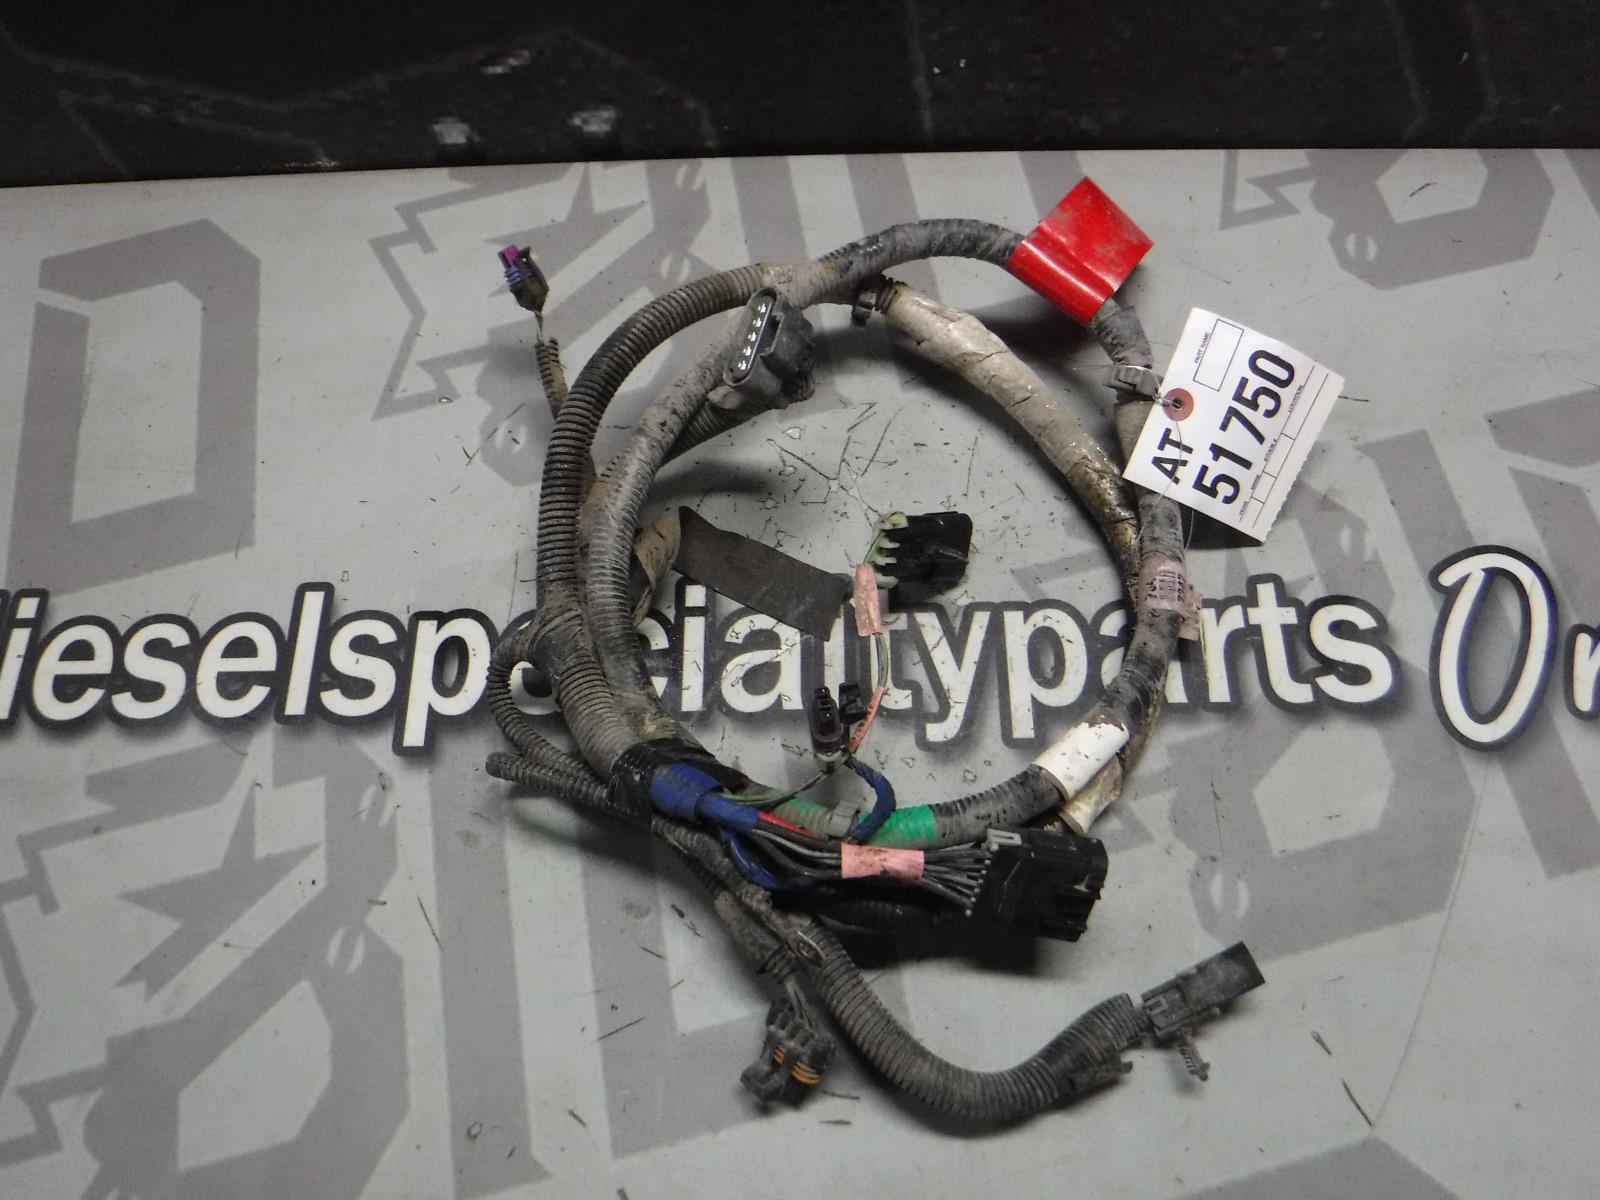 2004 - 2005 GMC 2500 LLY 6.6 ALLISON 4X4 TRANSFER CASE WIRING HARNESS OEM    eBay   2005 Gmc Wiring Harness      eBay